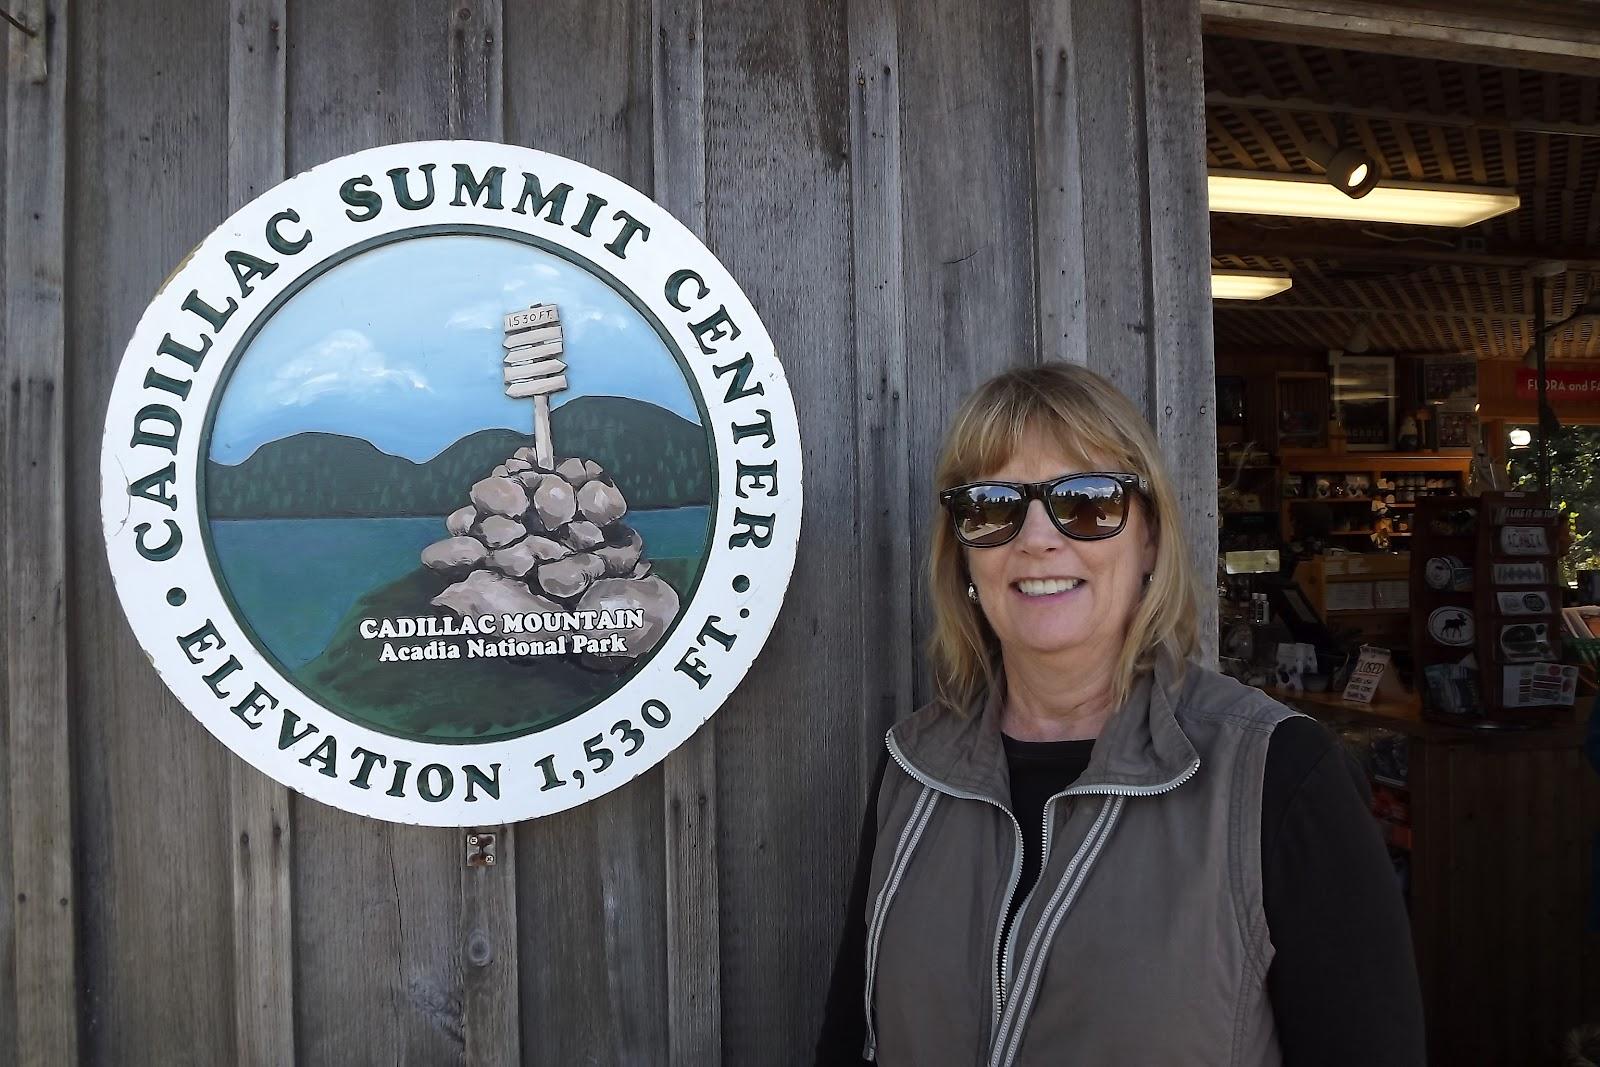 Cadillac Mountain Summit To Jordan S Restaurant Bar Harbor